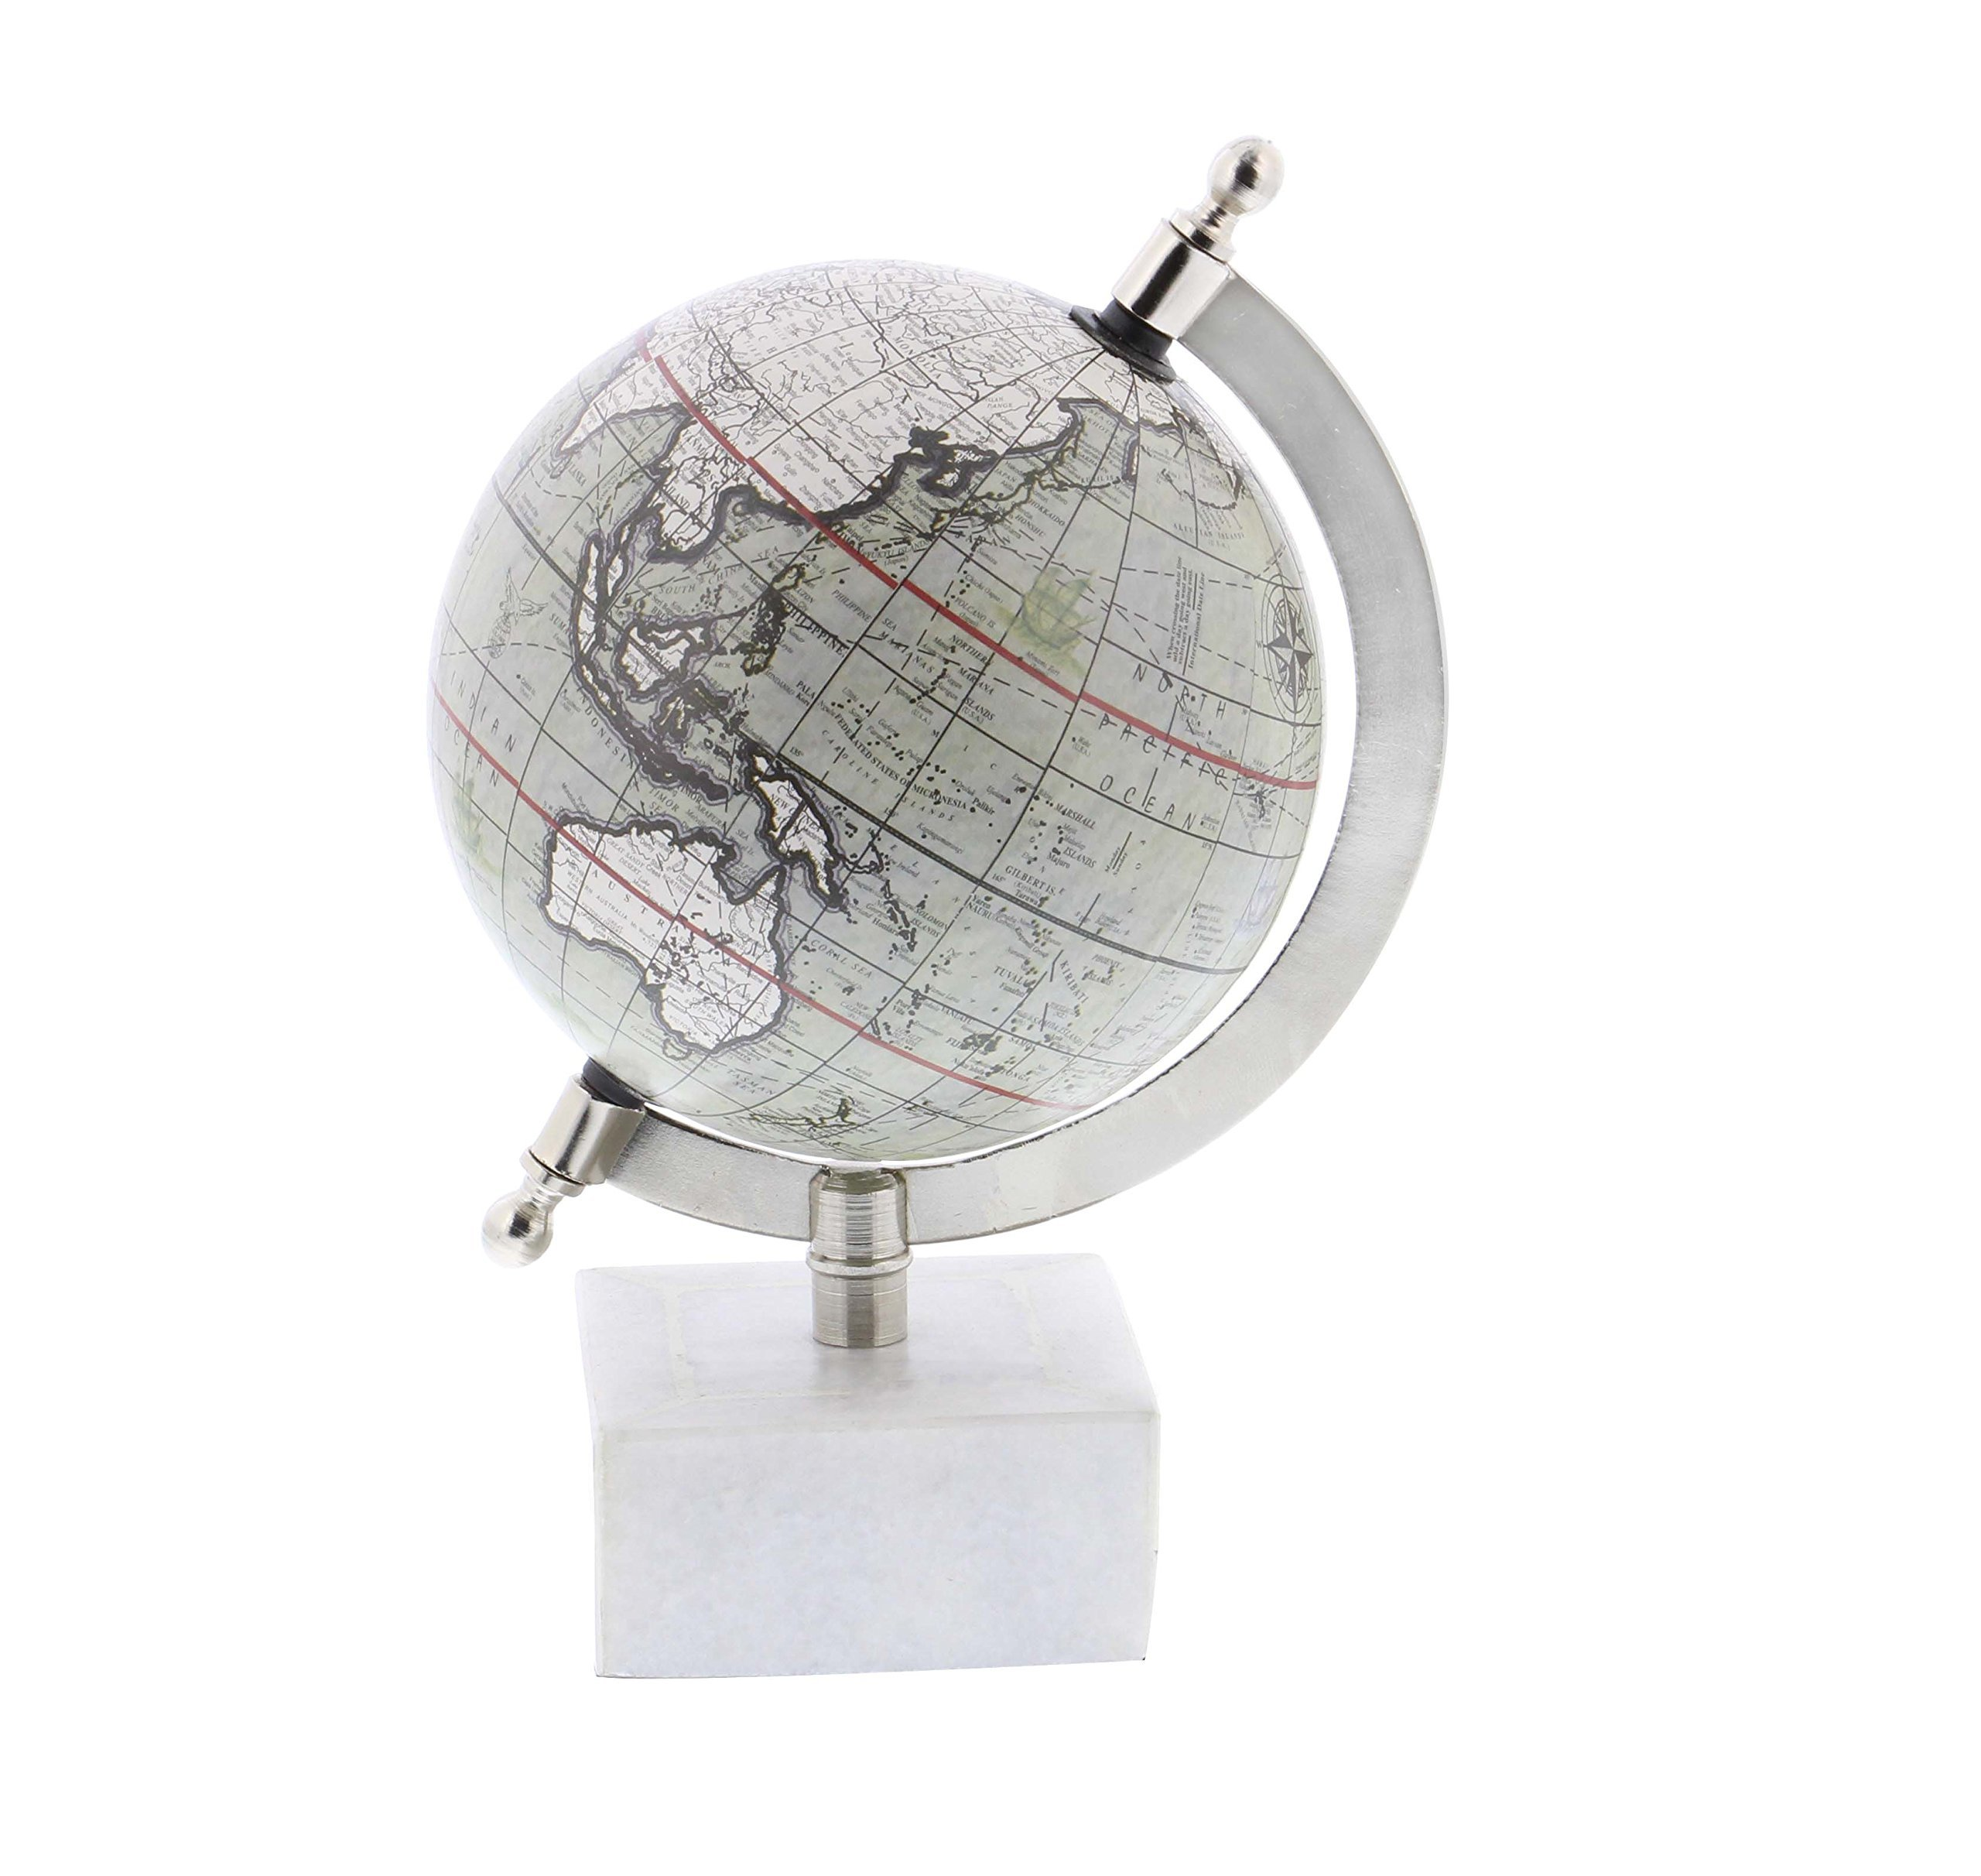 Deco 79 28544 Iron World Globe with Marble Base, 8'' x 5'', Black/White/Silver